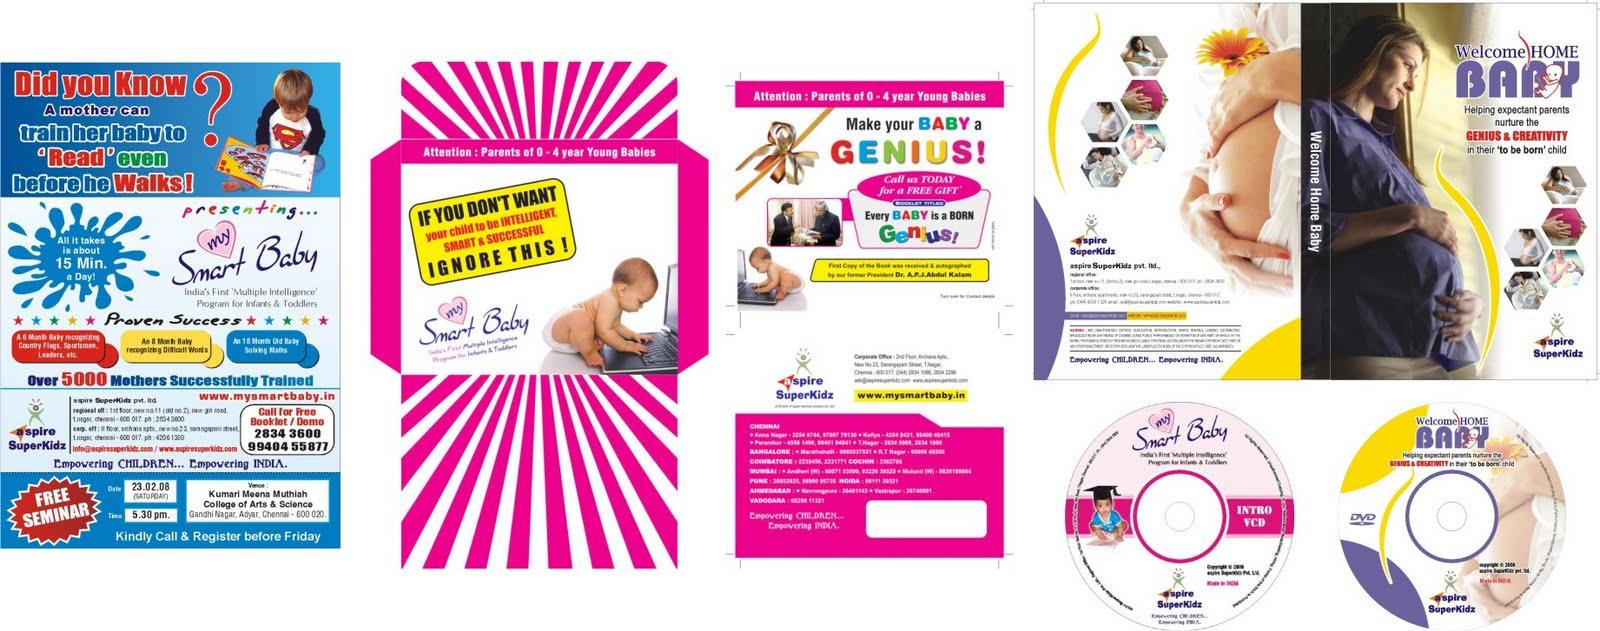 msb coupon dvd handbill